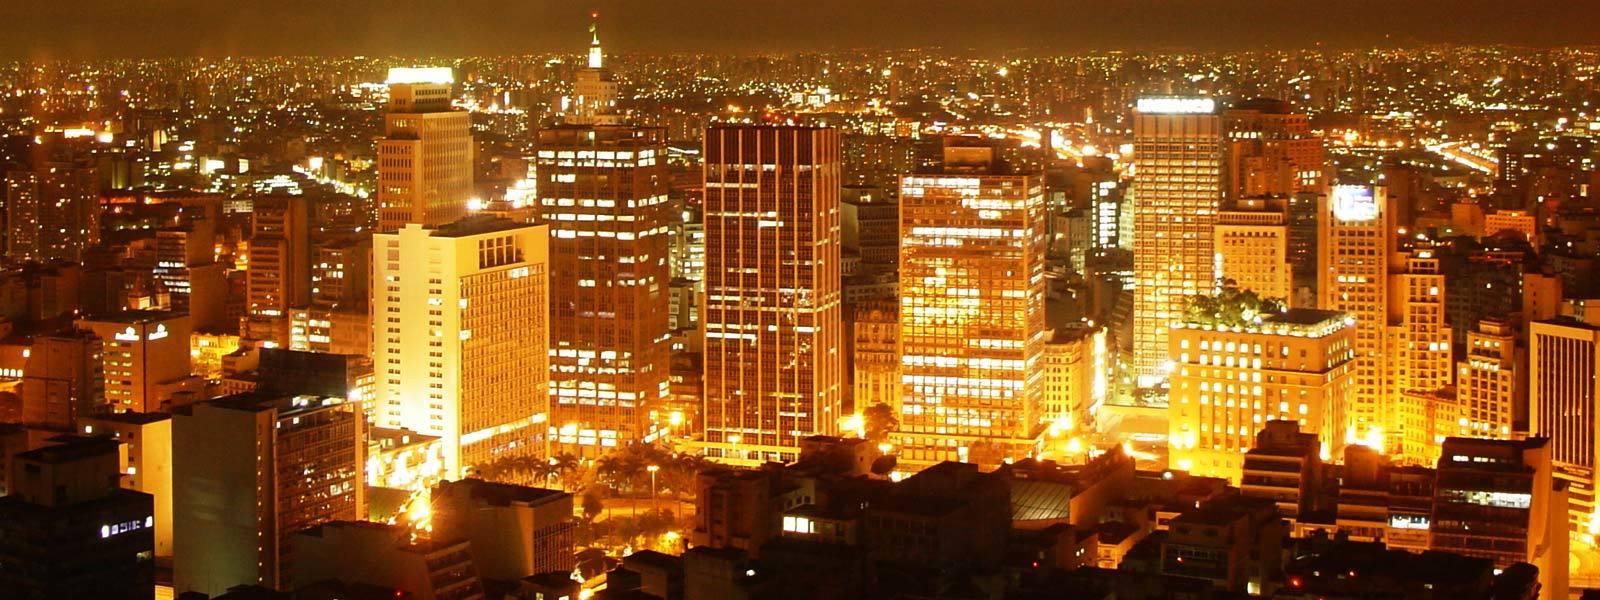 Hasil gambar untuk night scenery